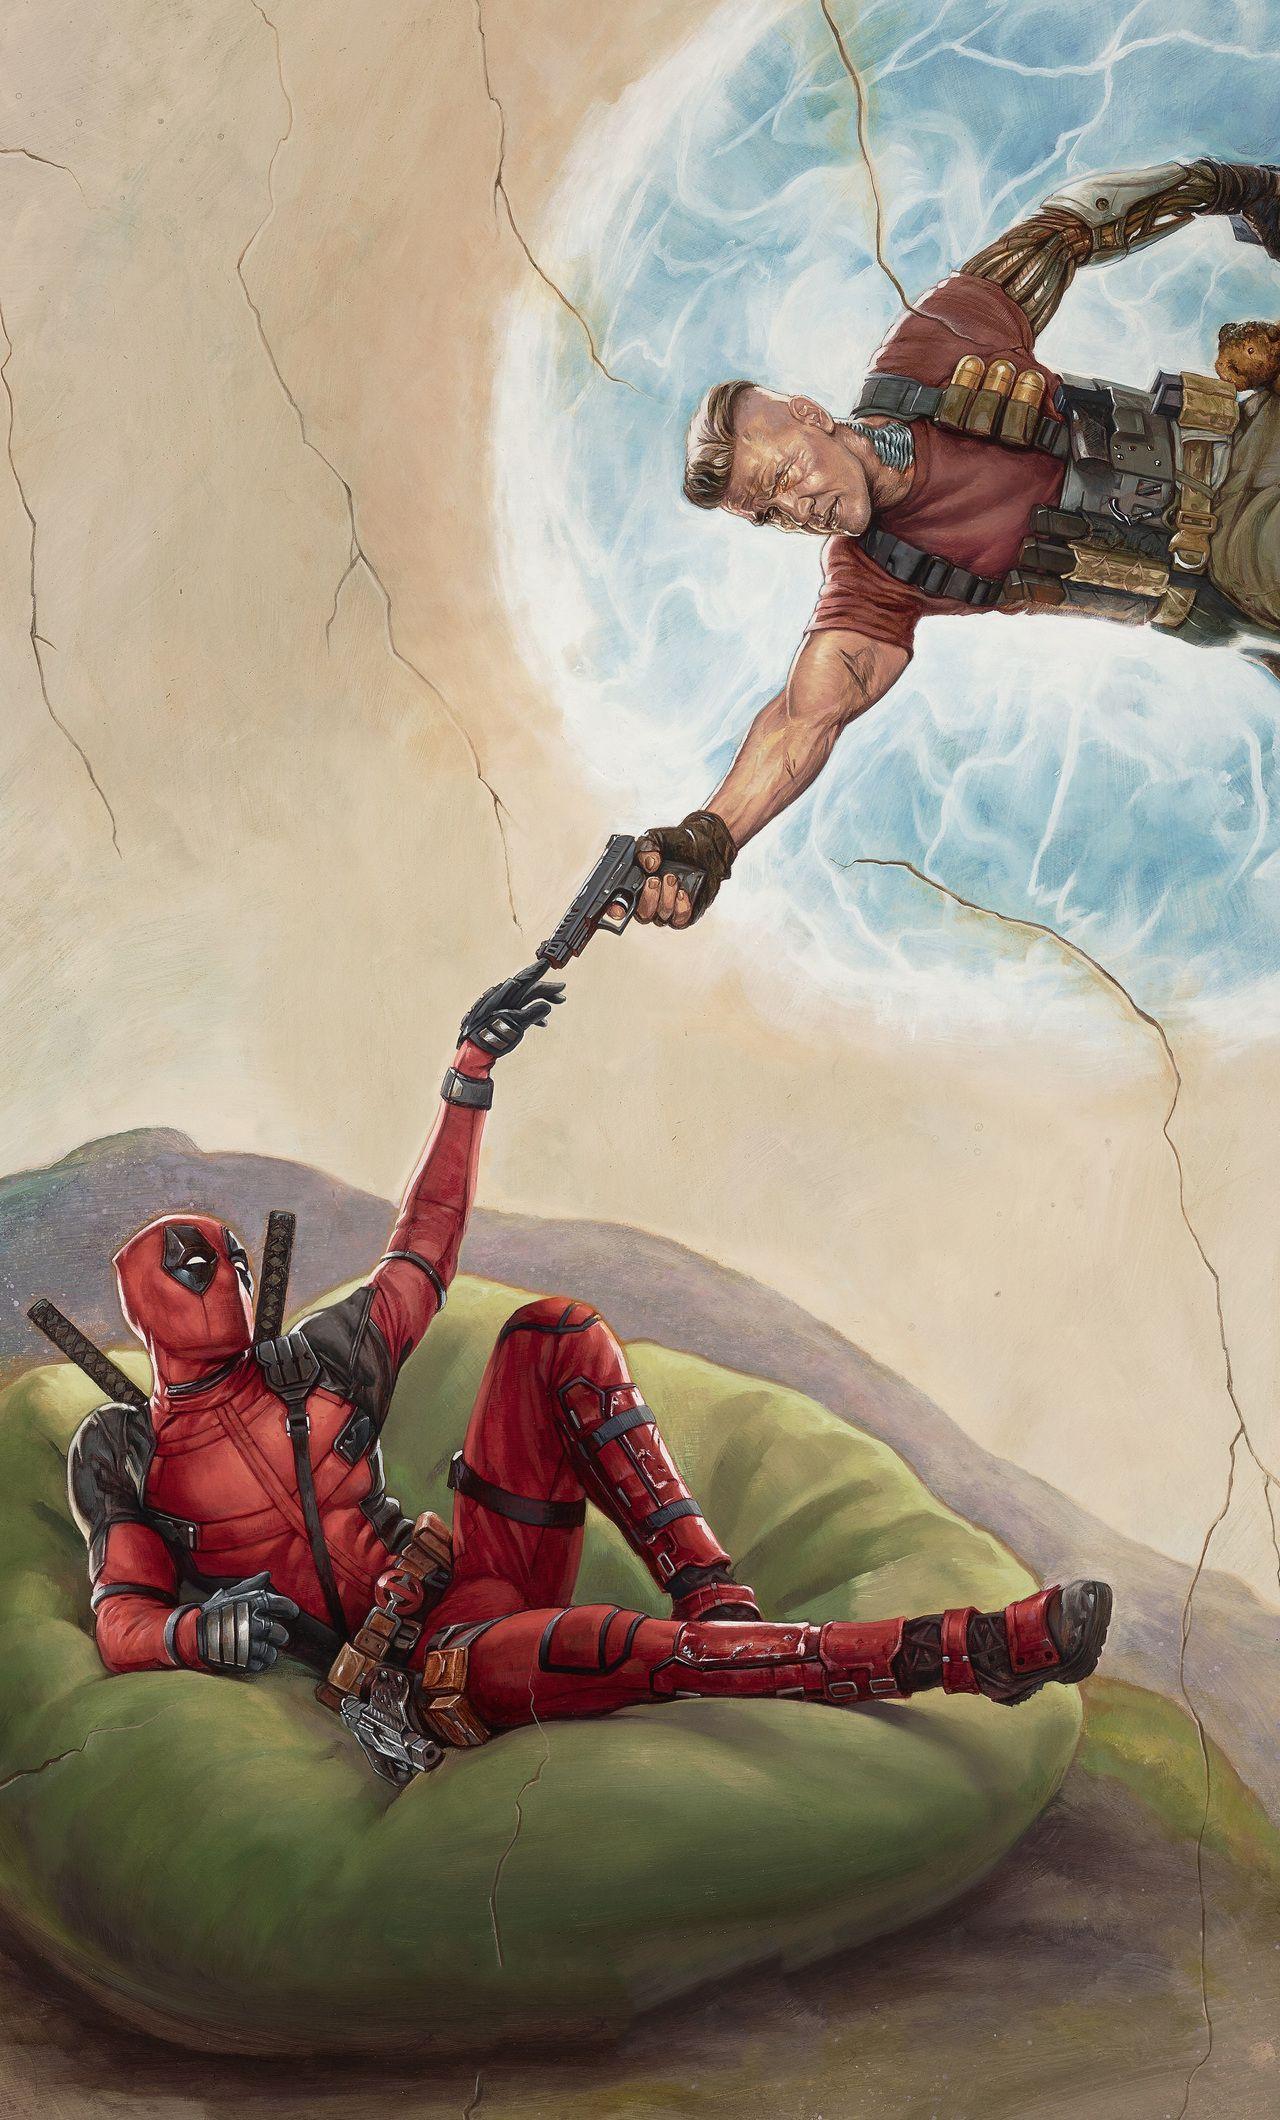 40 Best Free Deadpool 2 Iphone Wallpapers Wallpaperaccess